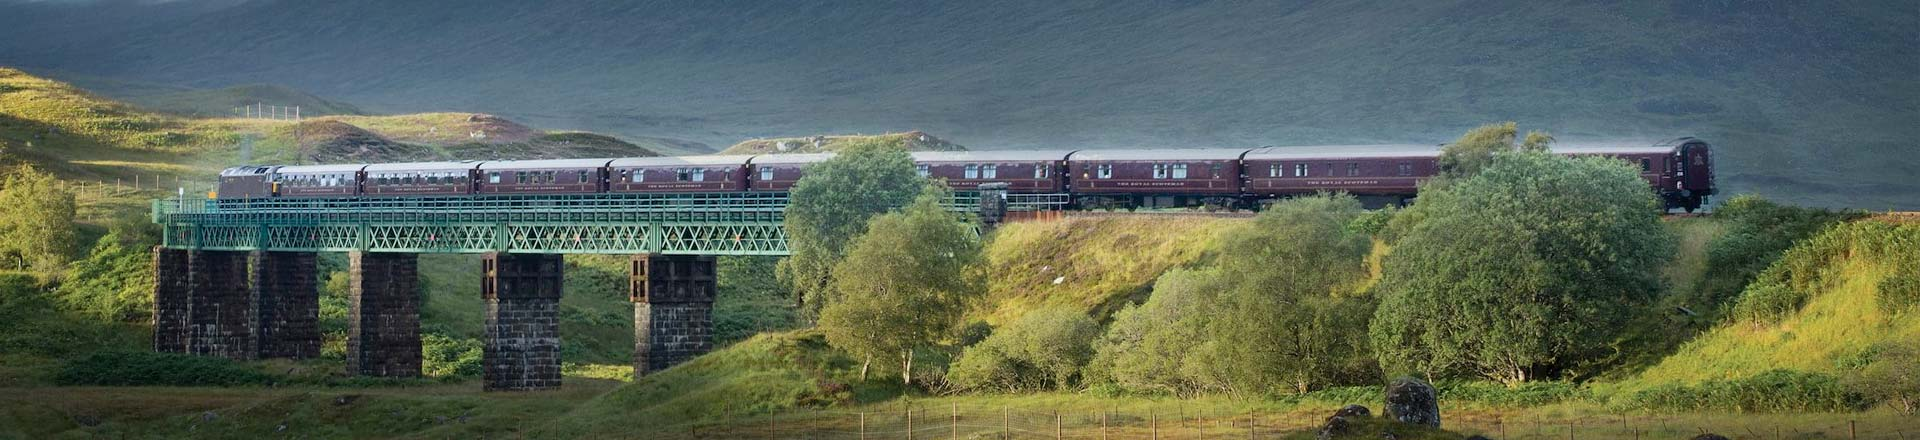 Luxury Train Journey Offer